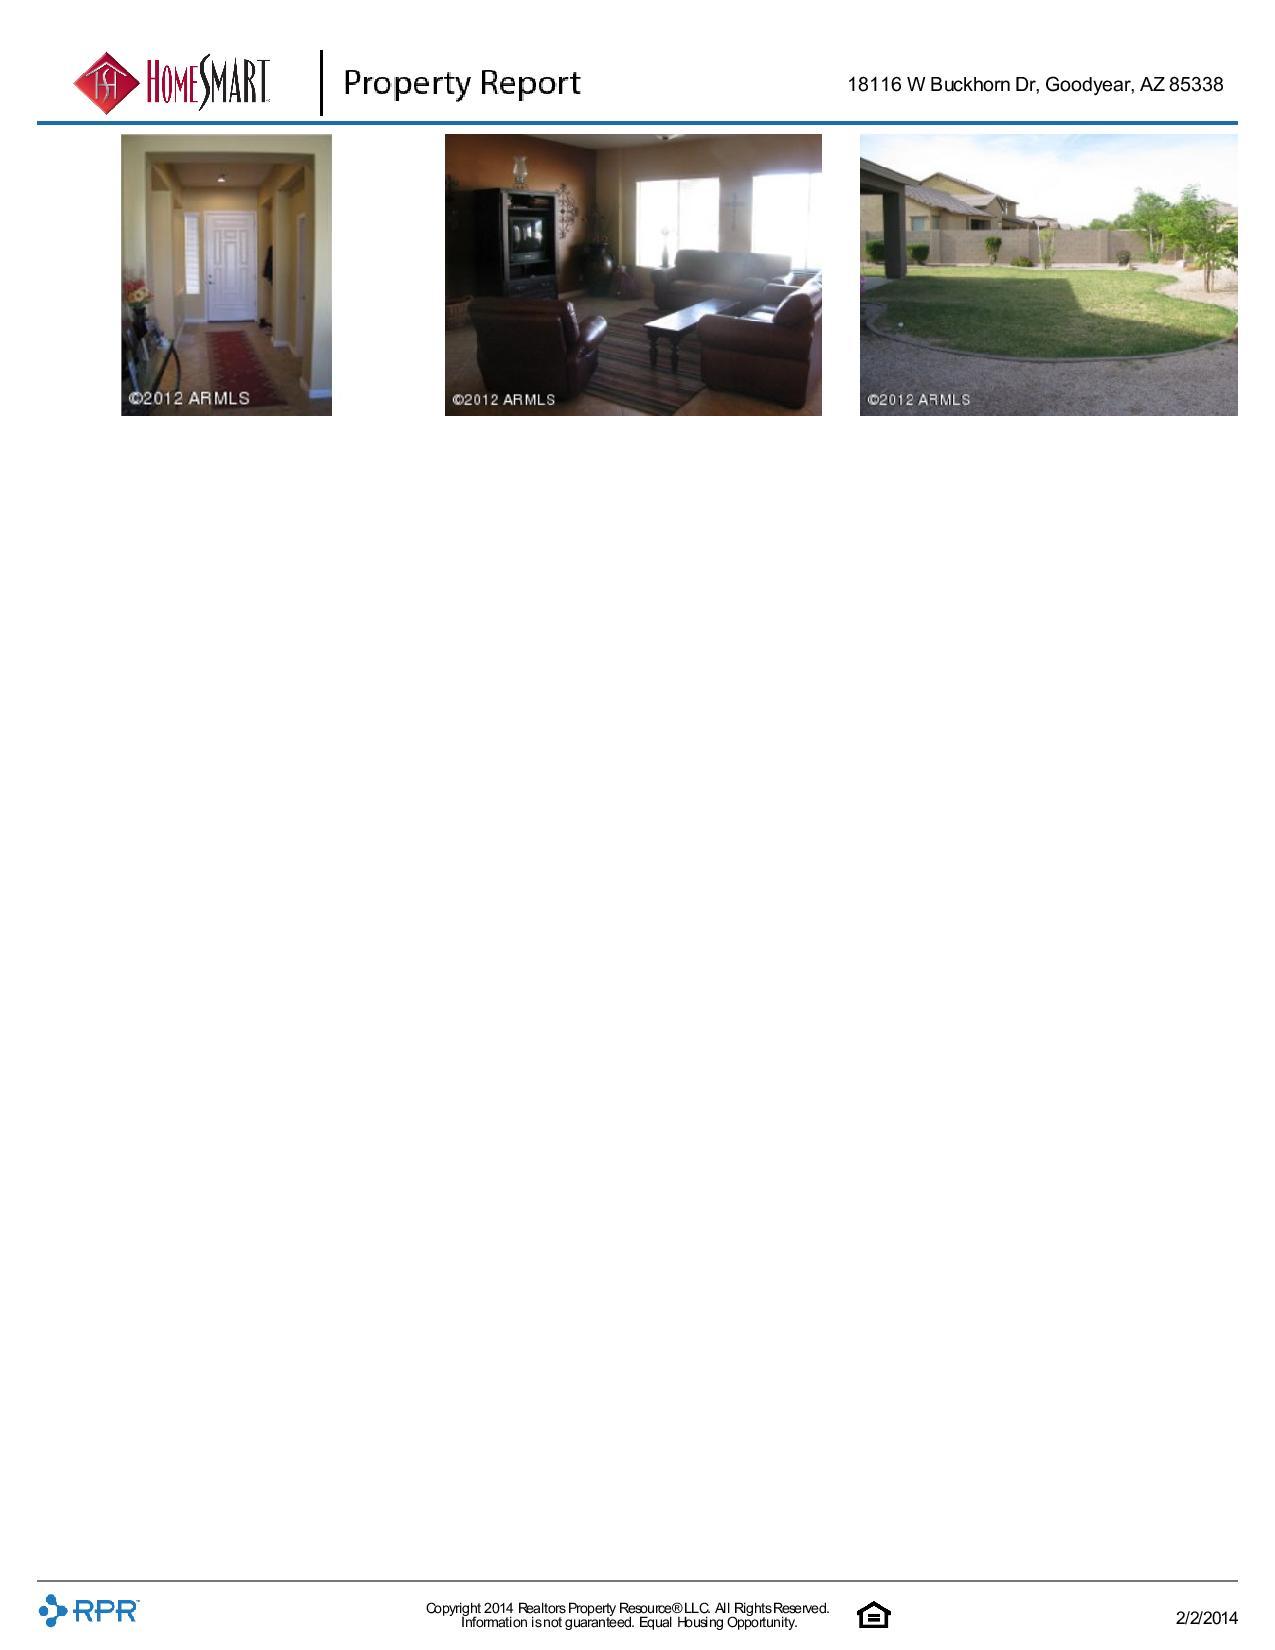 18116-W-Buckhorn-Dr-Goodyear-AZ-85338.pdf-page-008